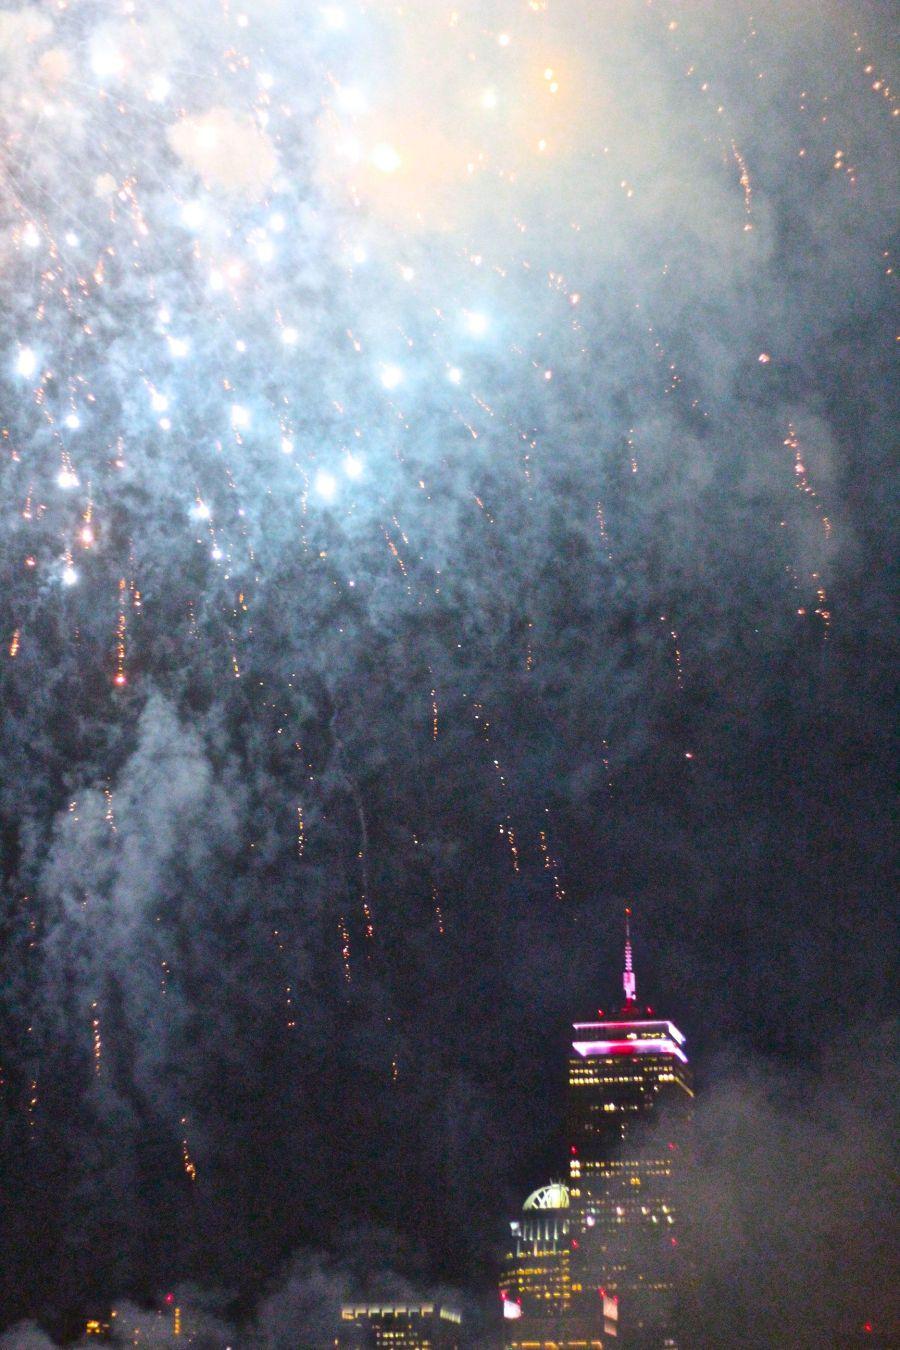 cambridge charles river fireworks 22